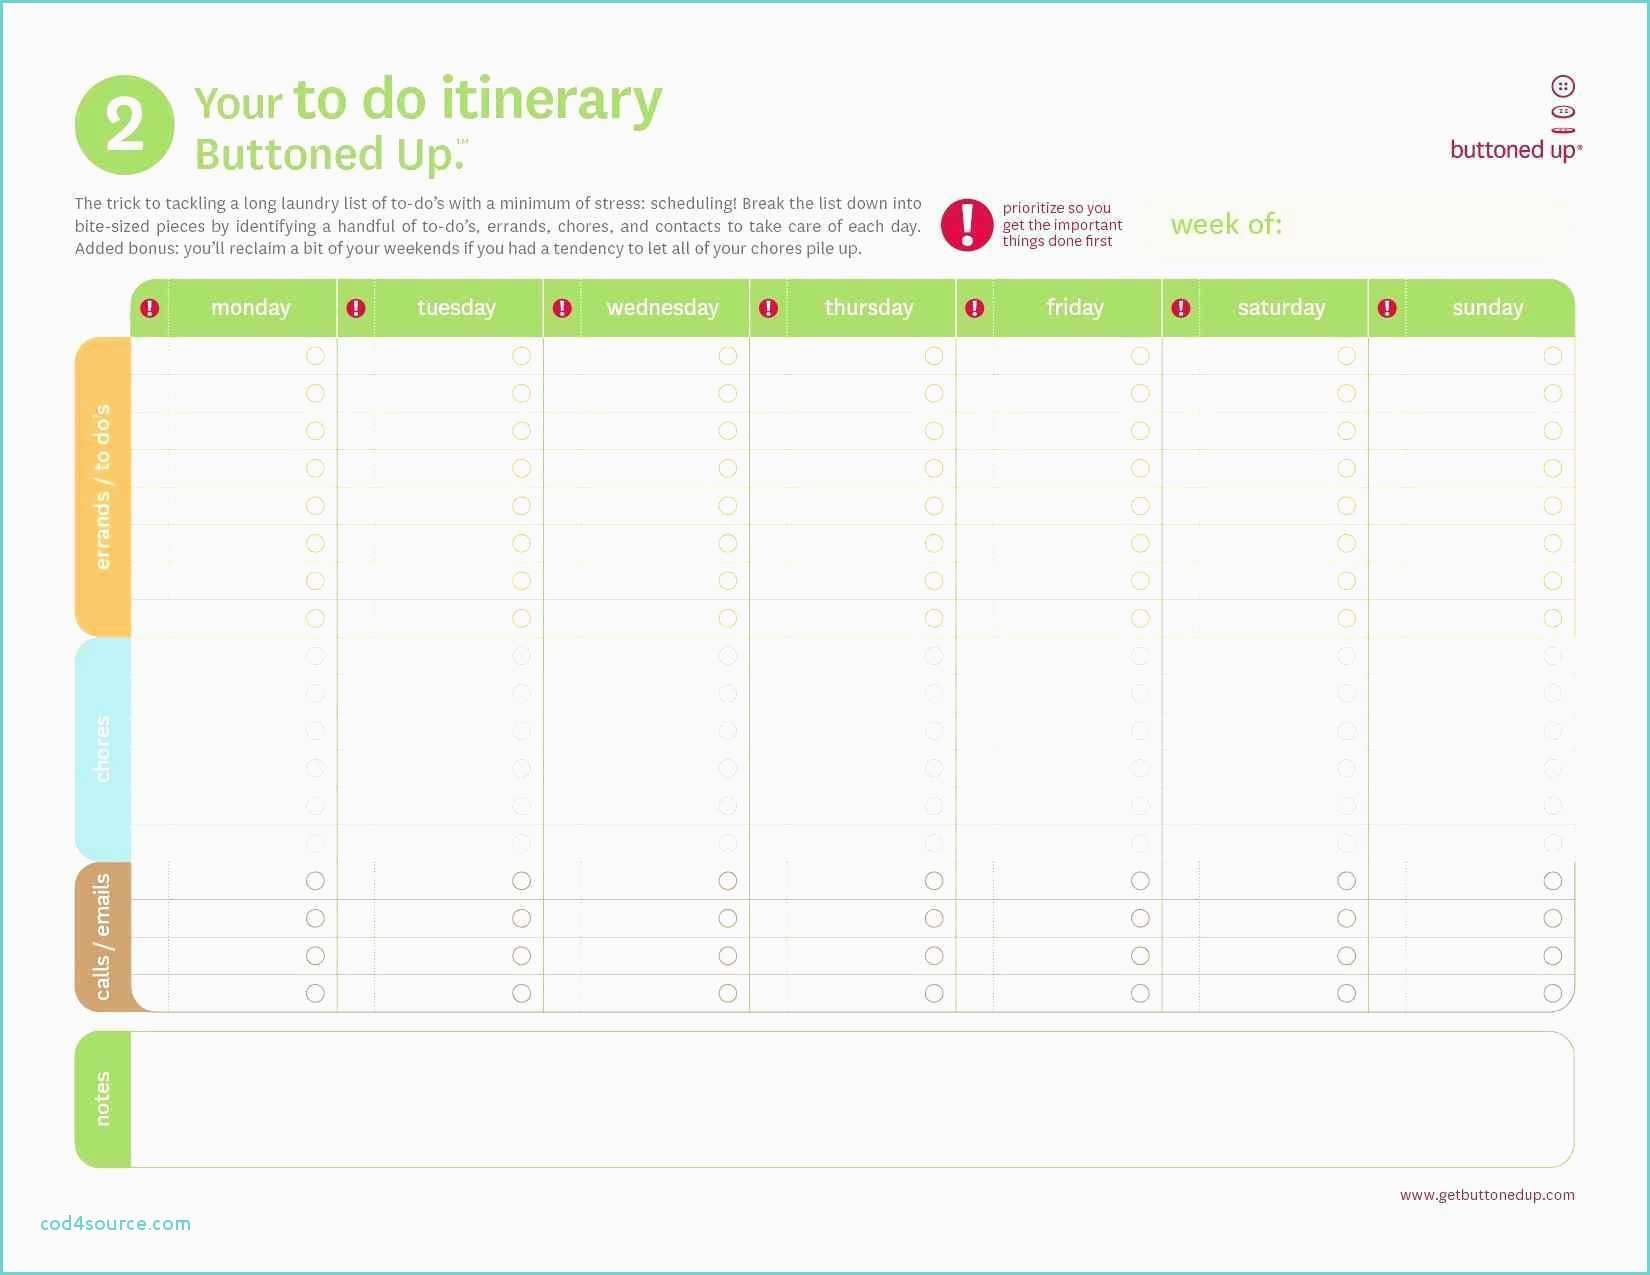 Travel Planner Excel Spreadsheetdb-excel.com : db-excel.com